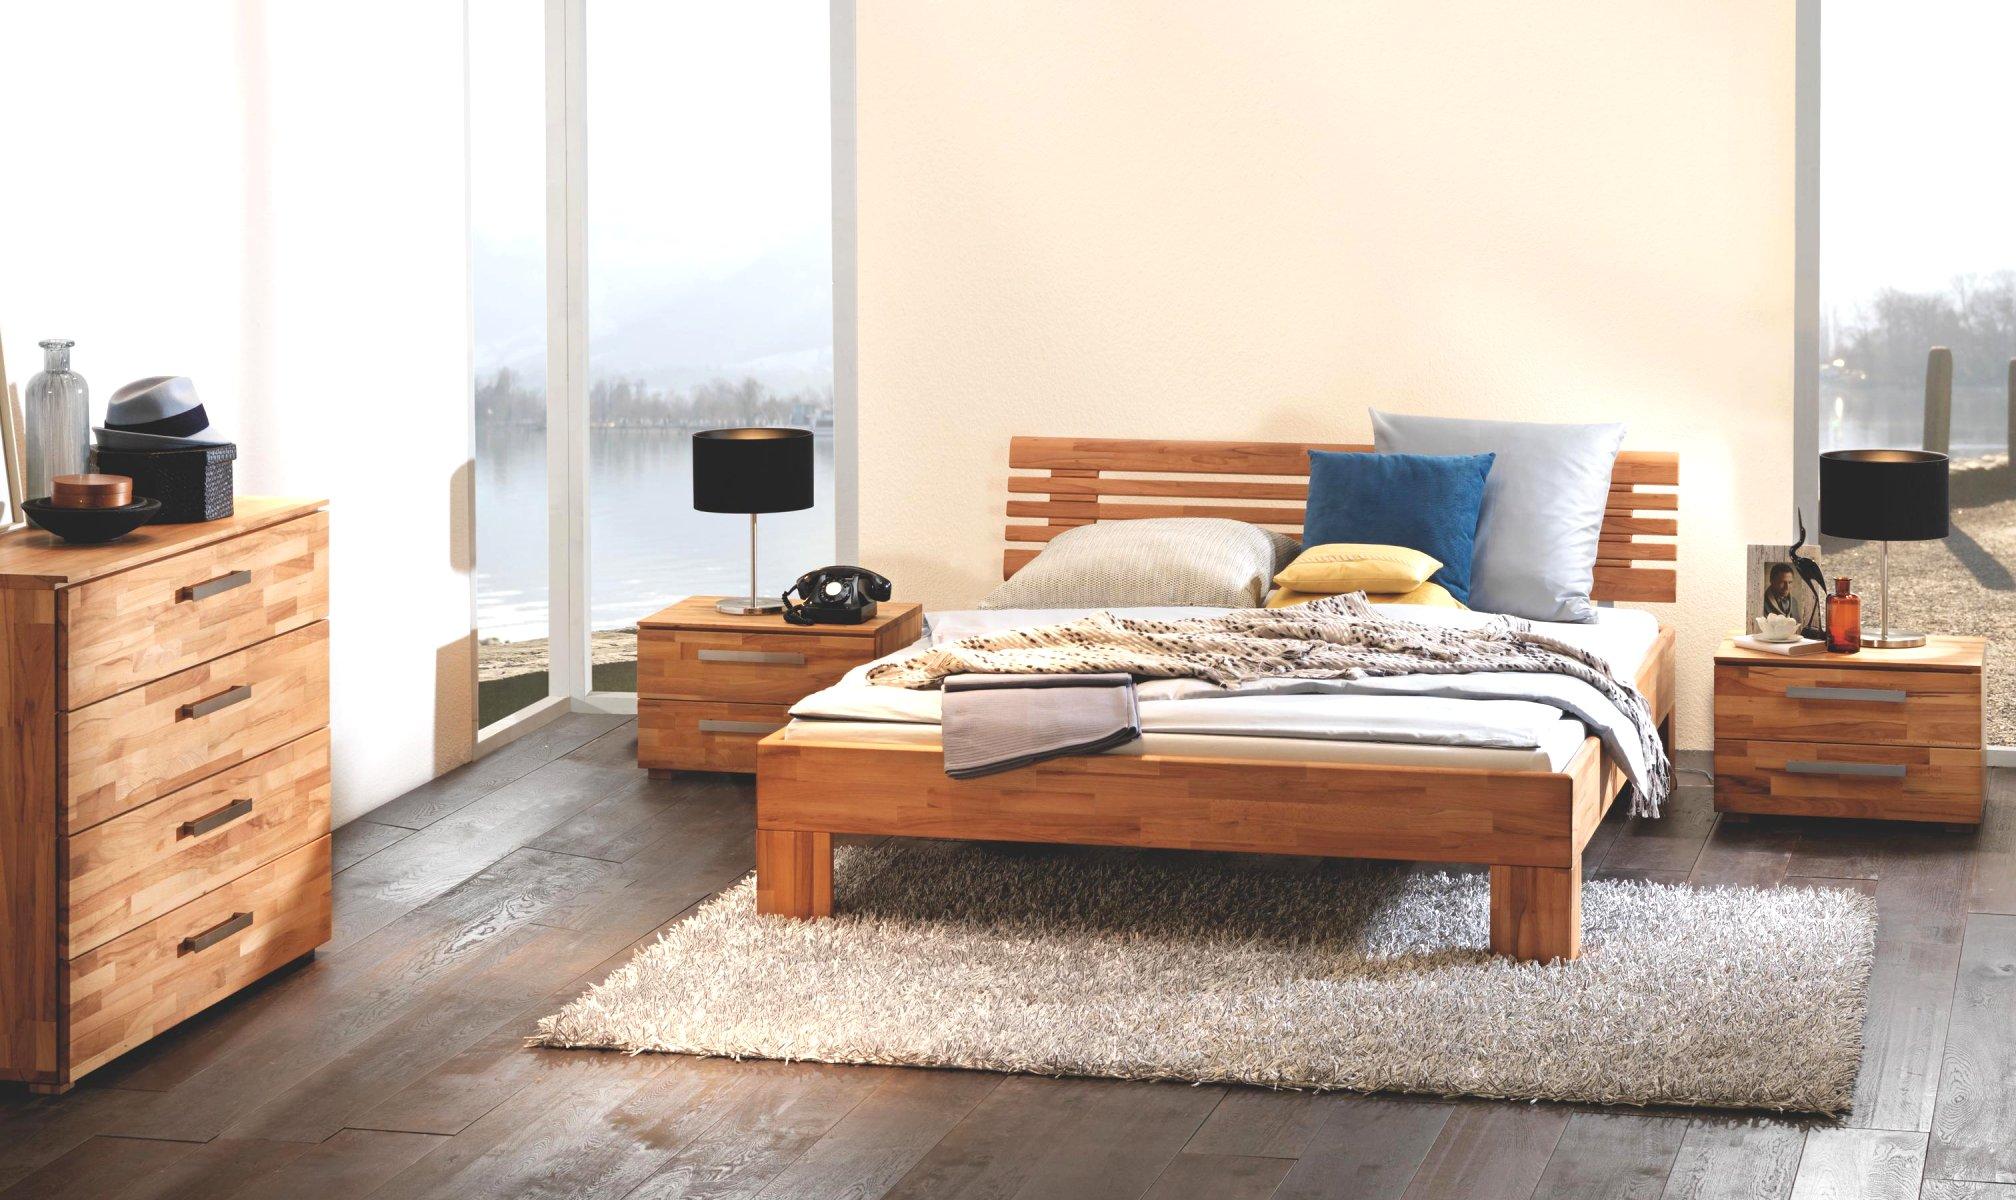 hasena woodline premium bett massa litto kernbuche ge lt natur 140 160 180 200 x 200 220. Black Bedroom Furniture Sets. Home Design Ideas